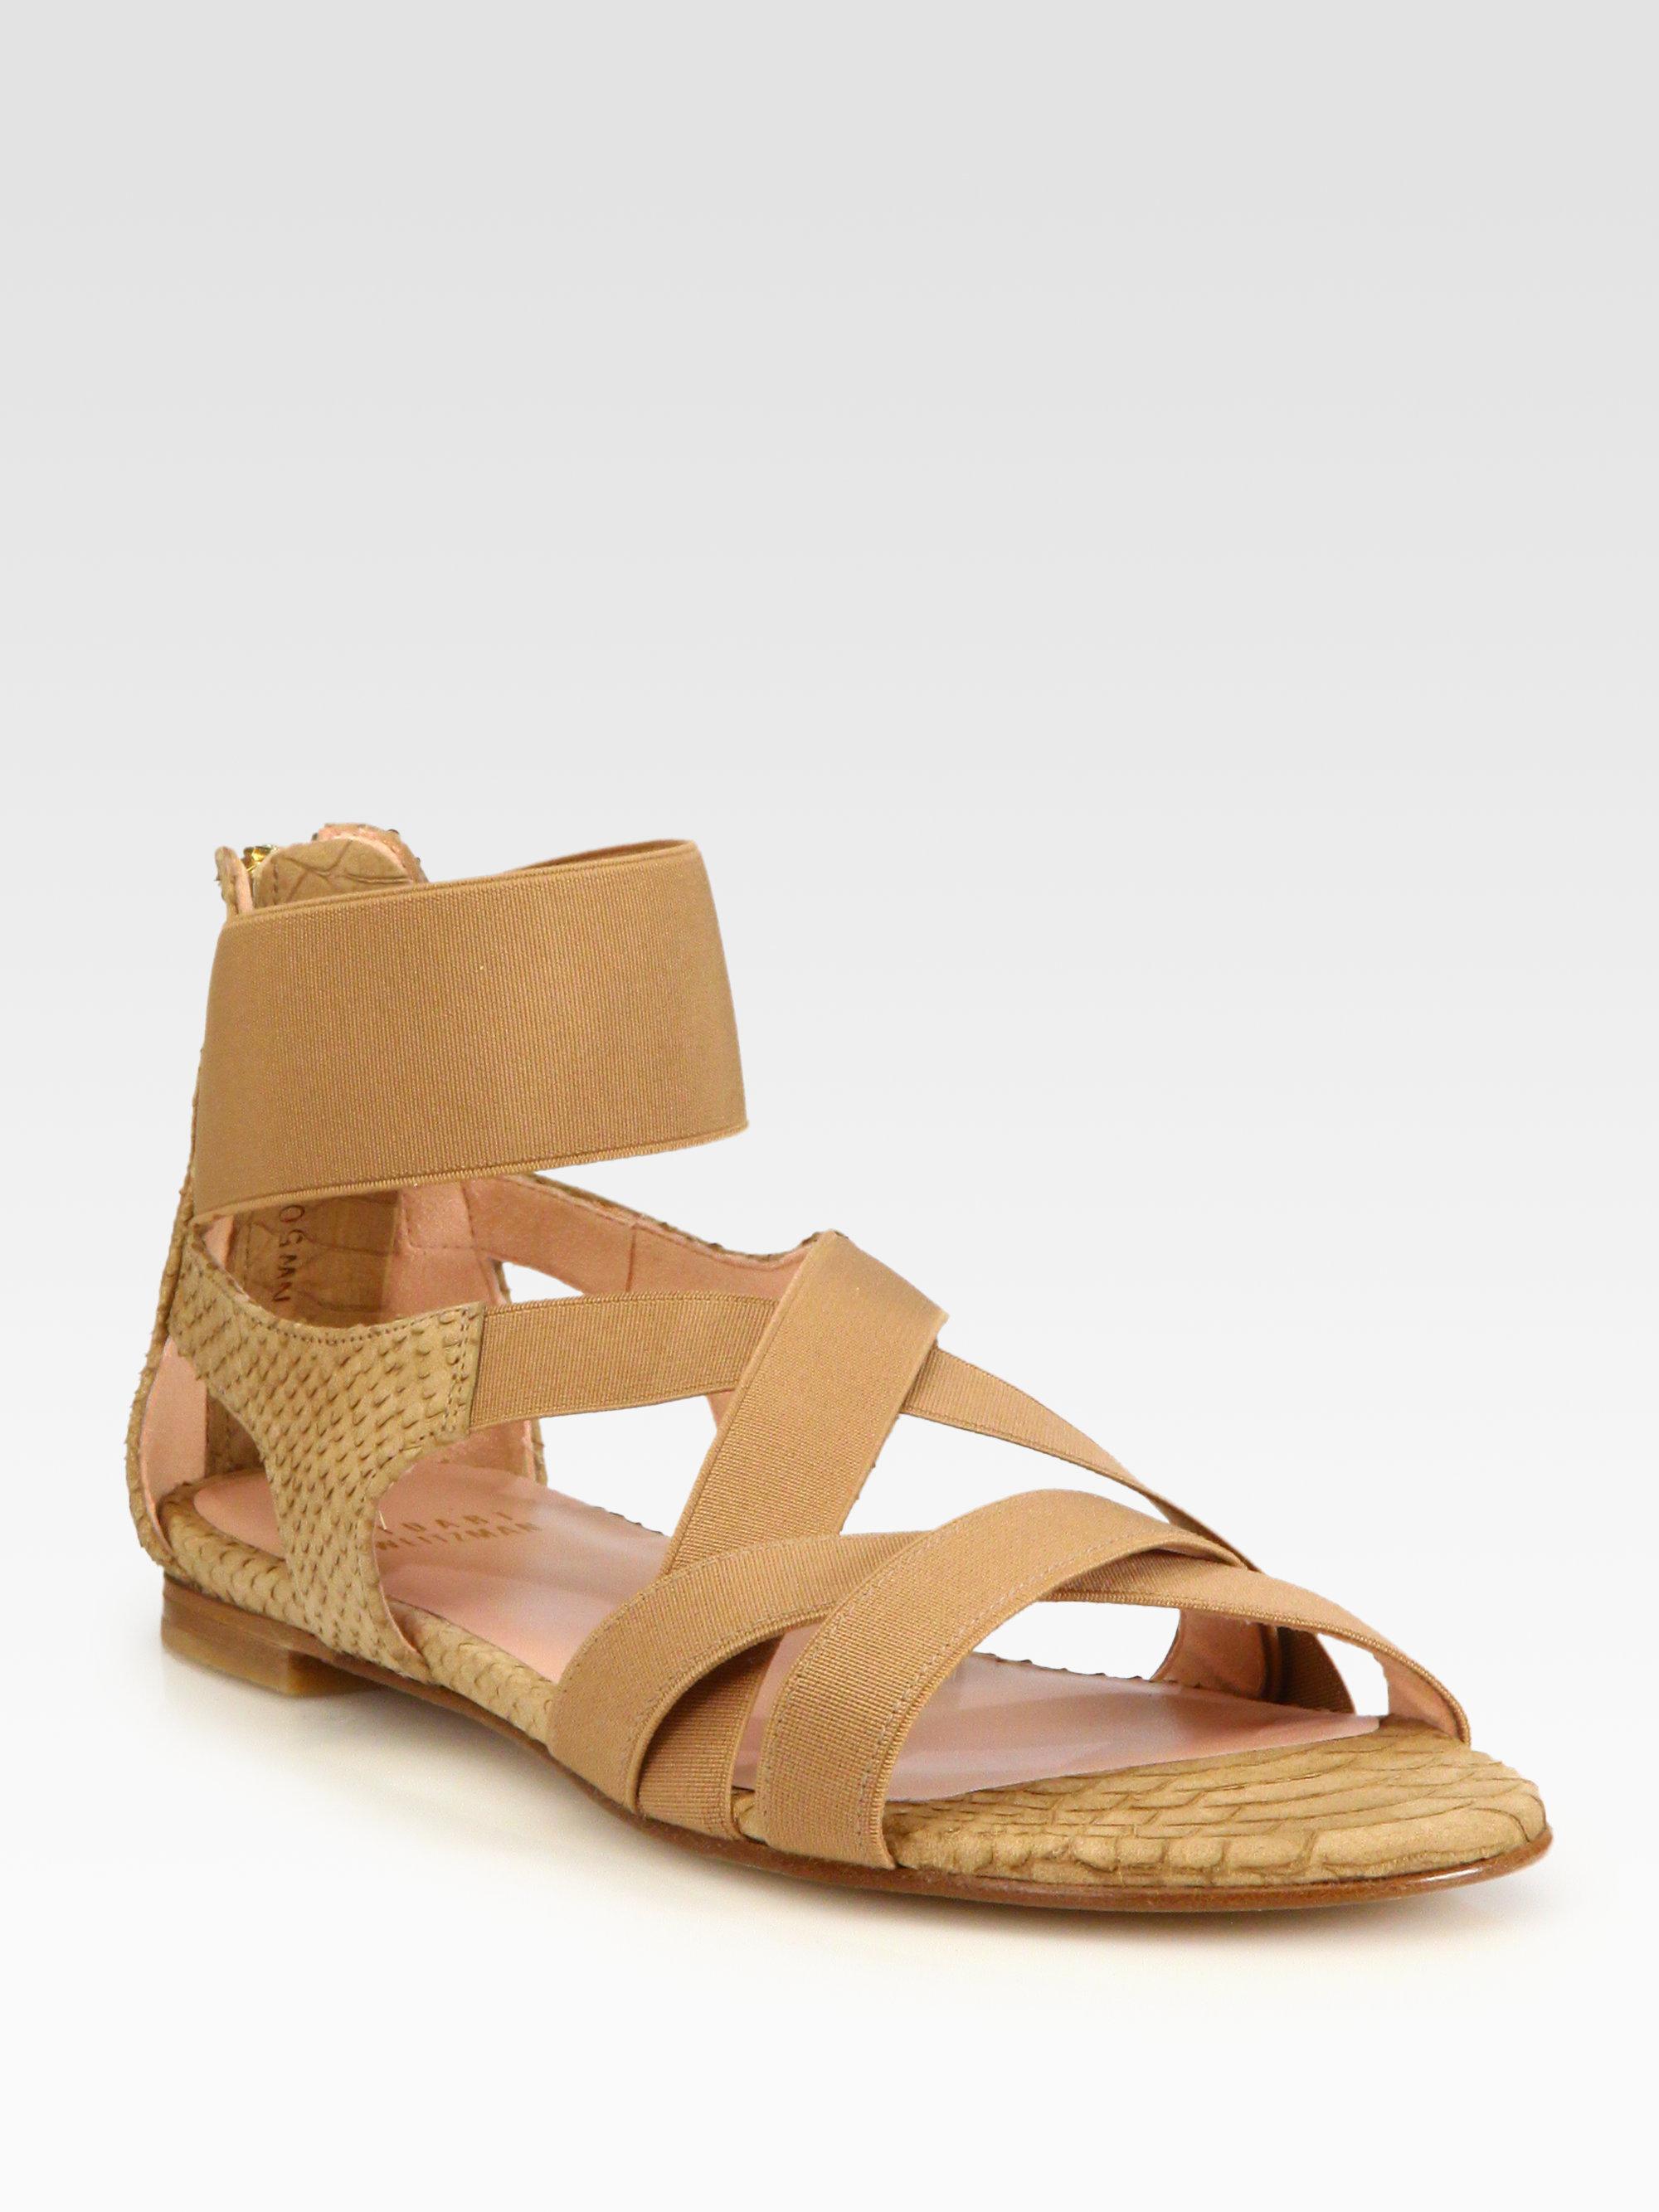 Elliott Criss Cross Banded Sandals qsc4eIaq05